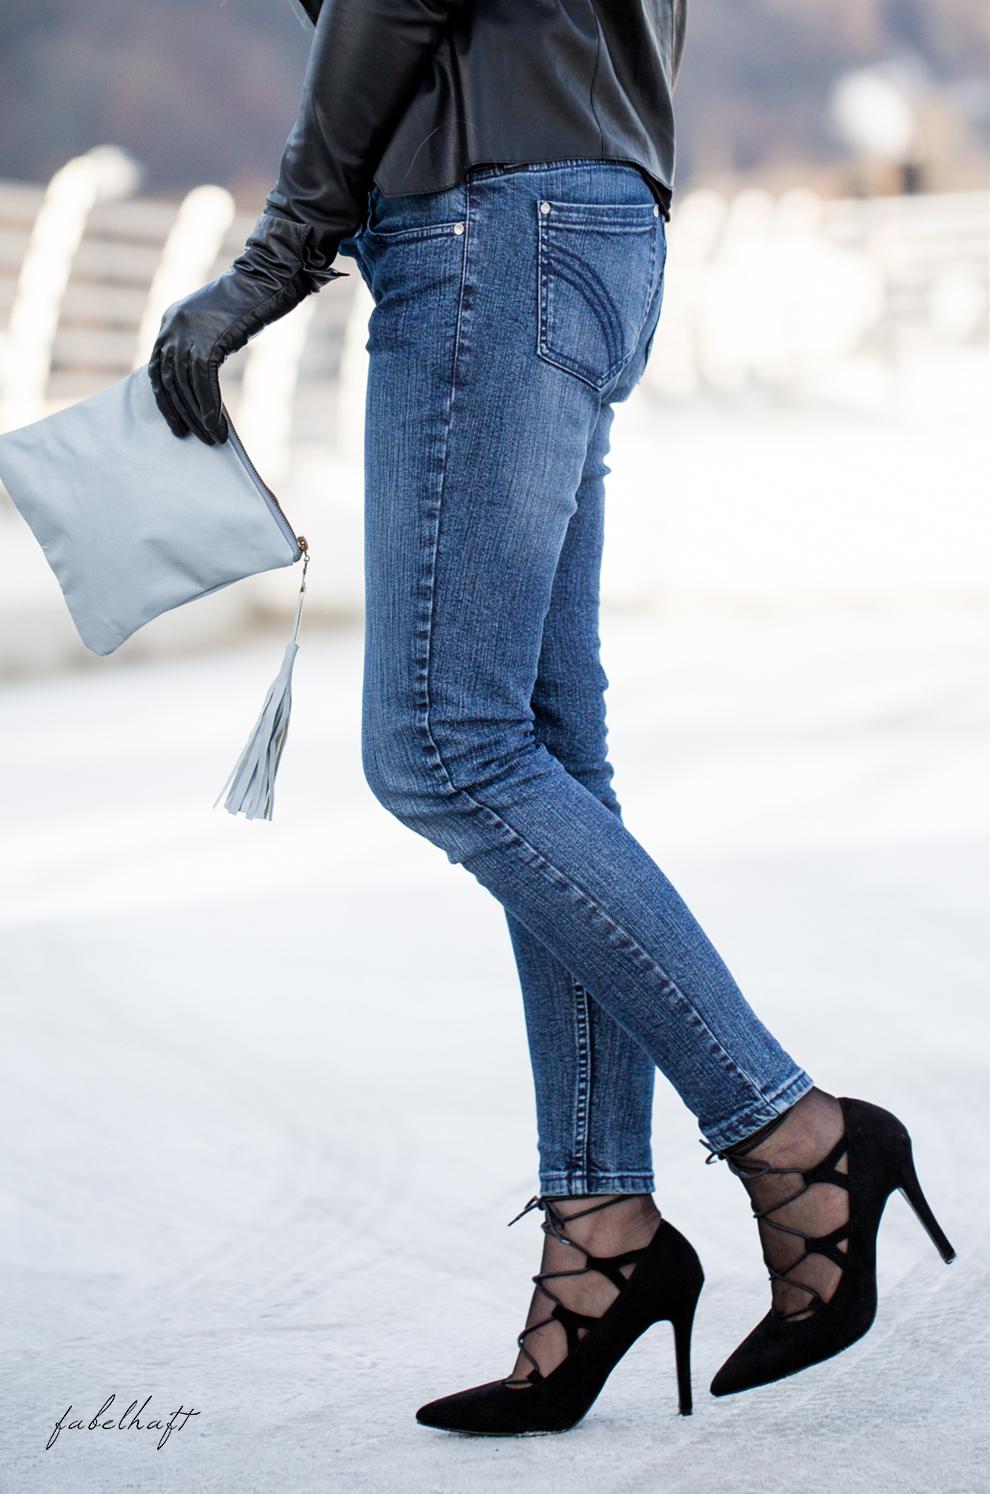 die-jeans-massgeschneiderte-fein-und-fabelhaft-jeansmodell-cocktail-gin-granatapfel-bar-winter-outfit-geschenk-christmas-2